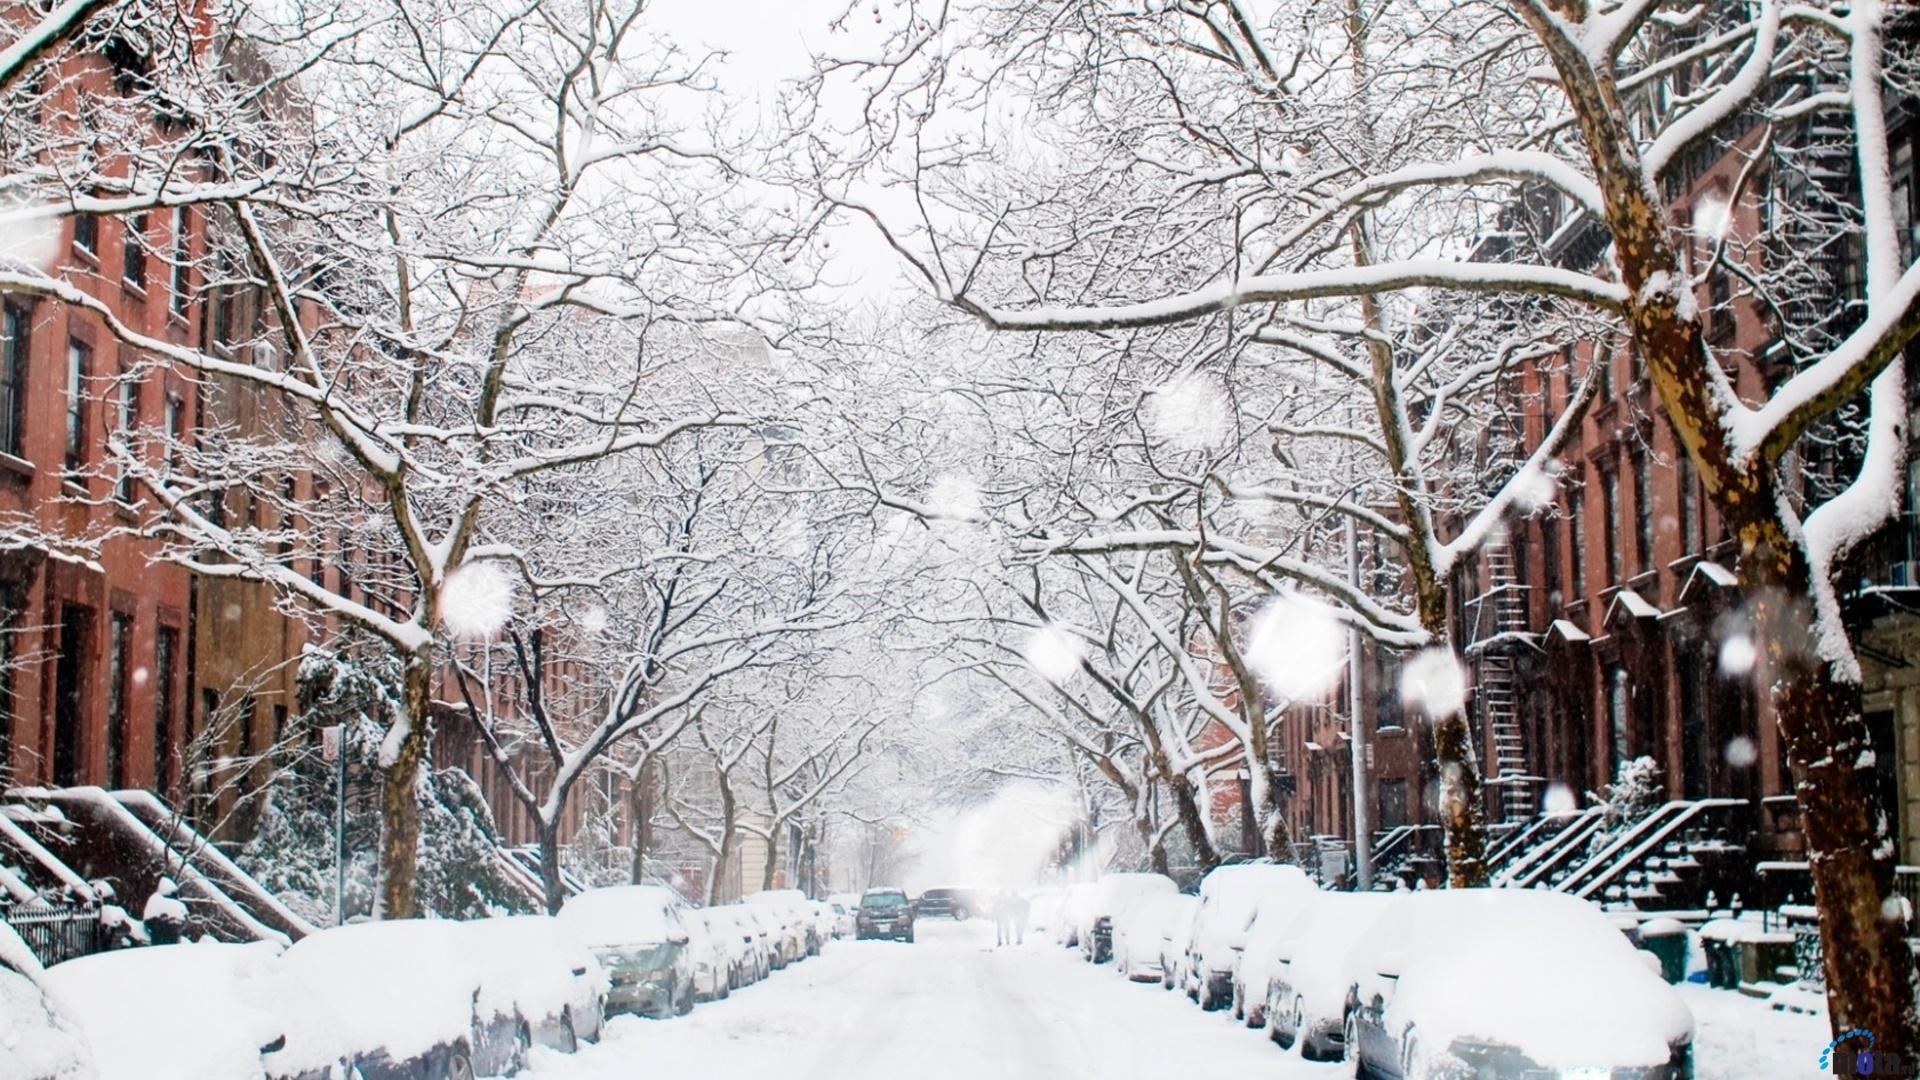 Winter City Wallpaper Free